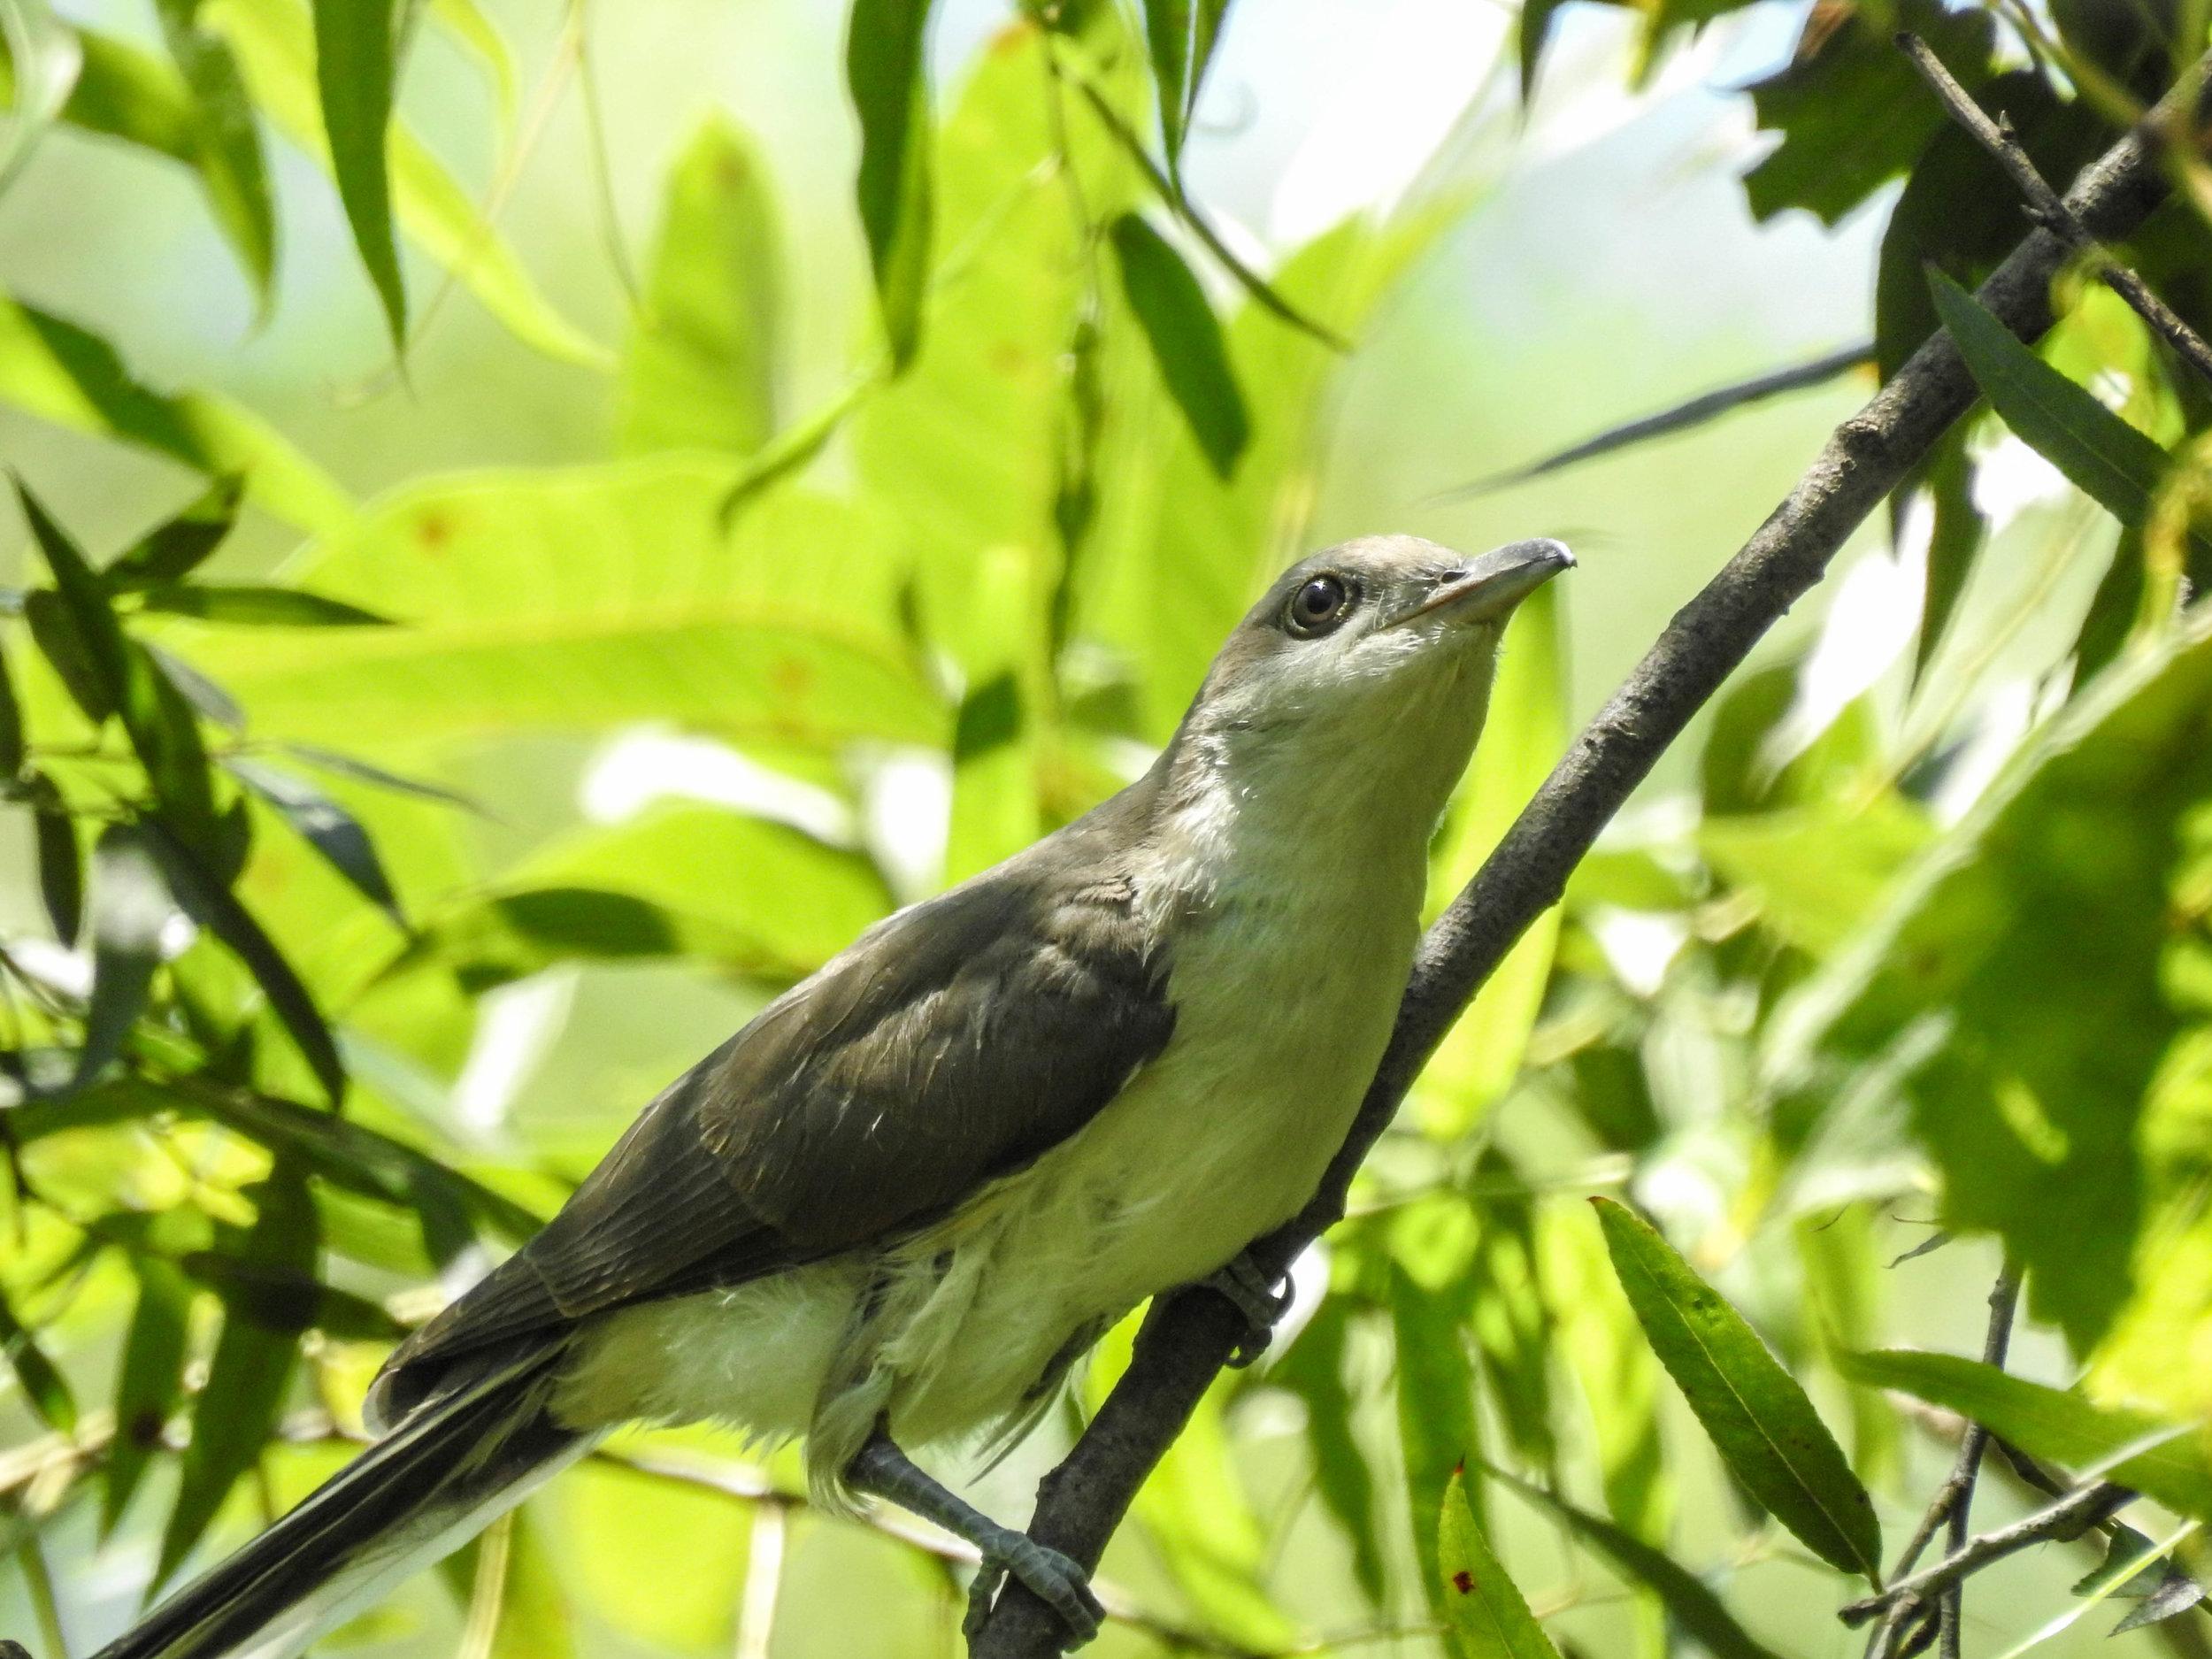 Yellow-billed Cuckoo, immature